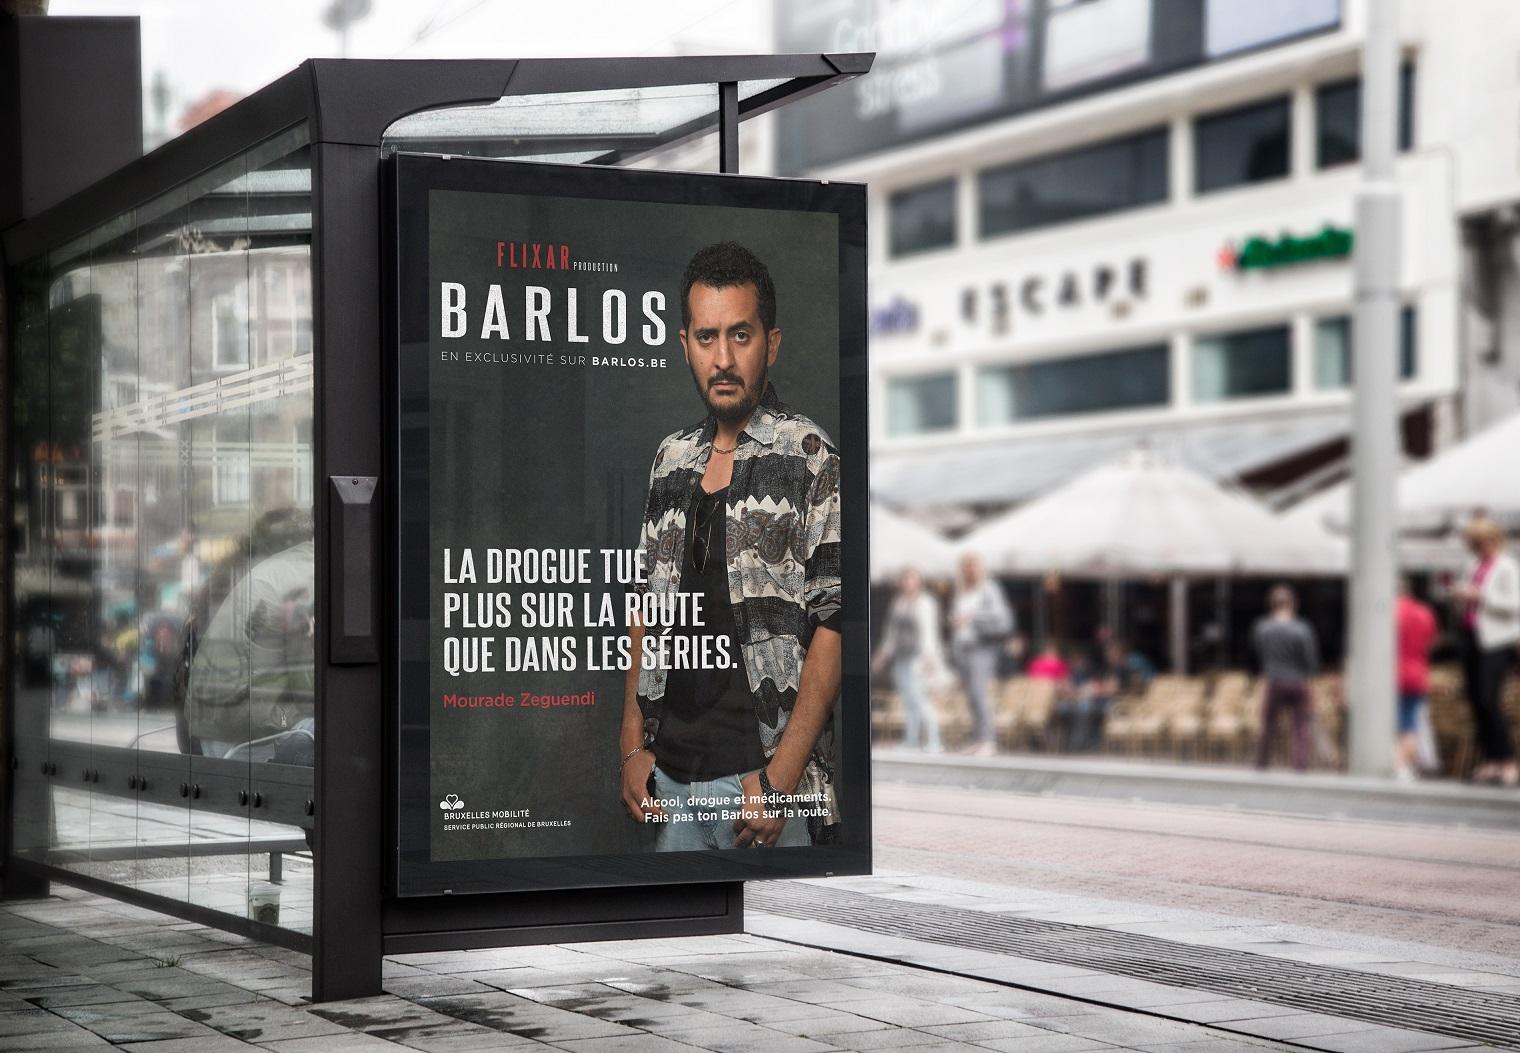 Barlos-Mourad_Abribus 40